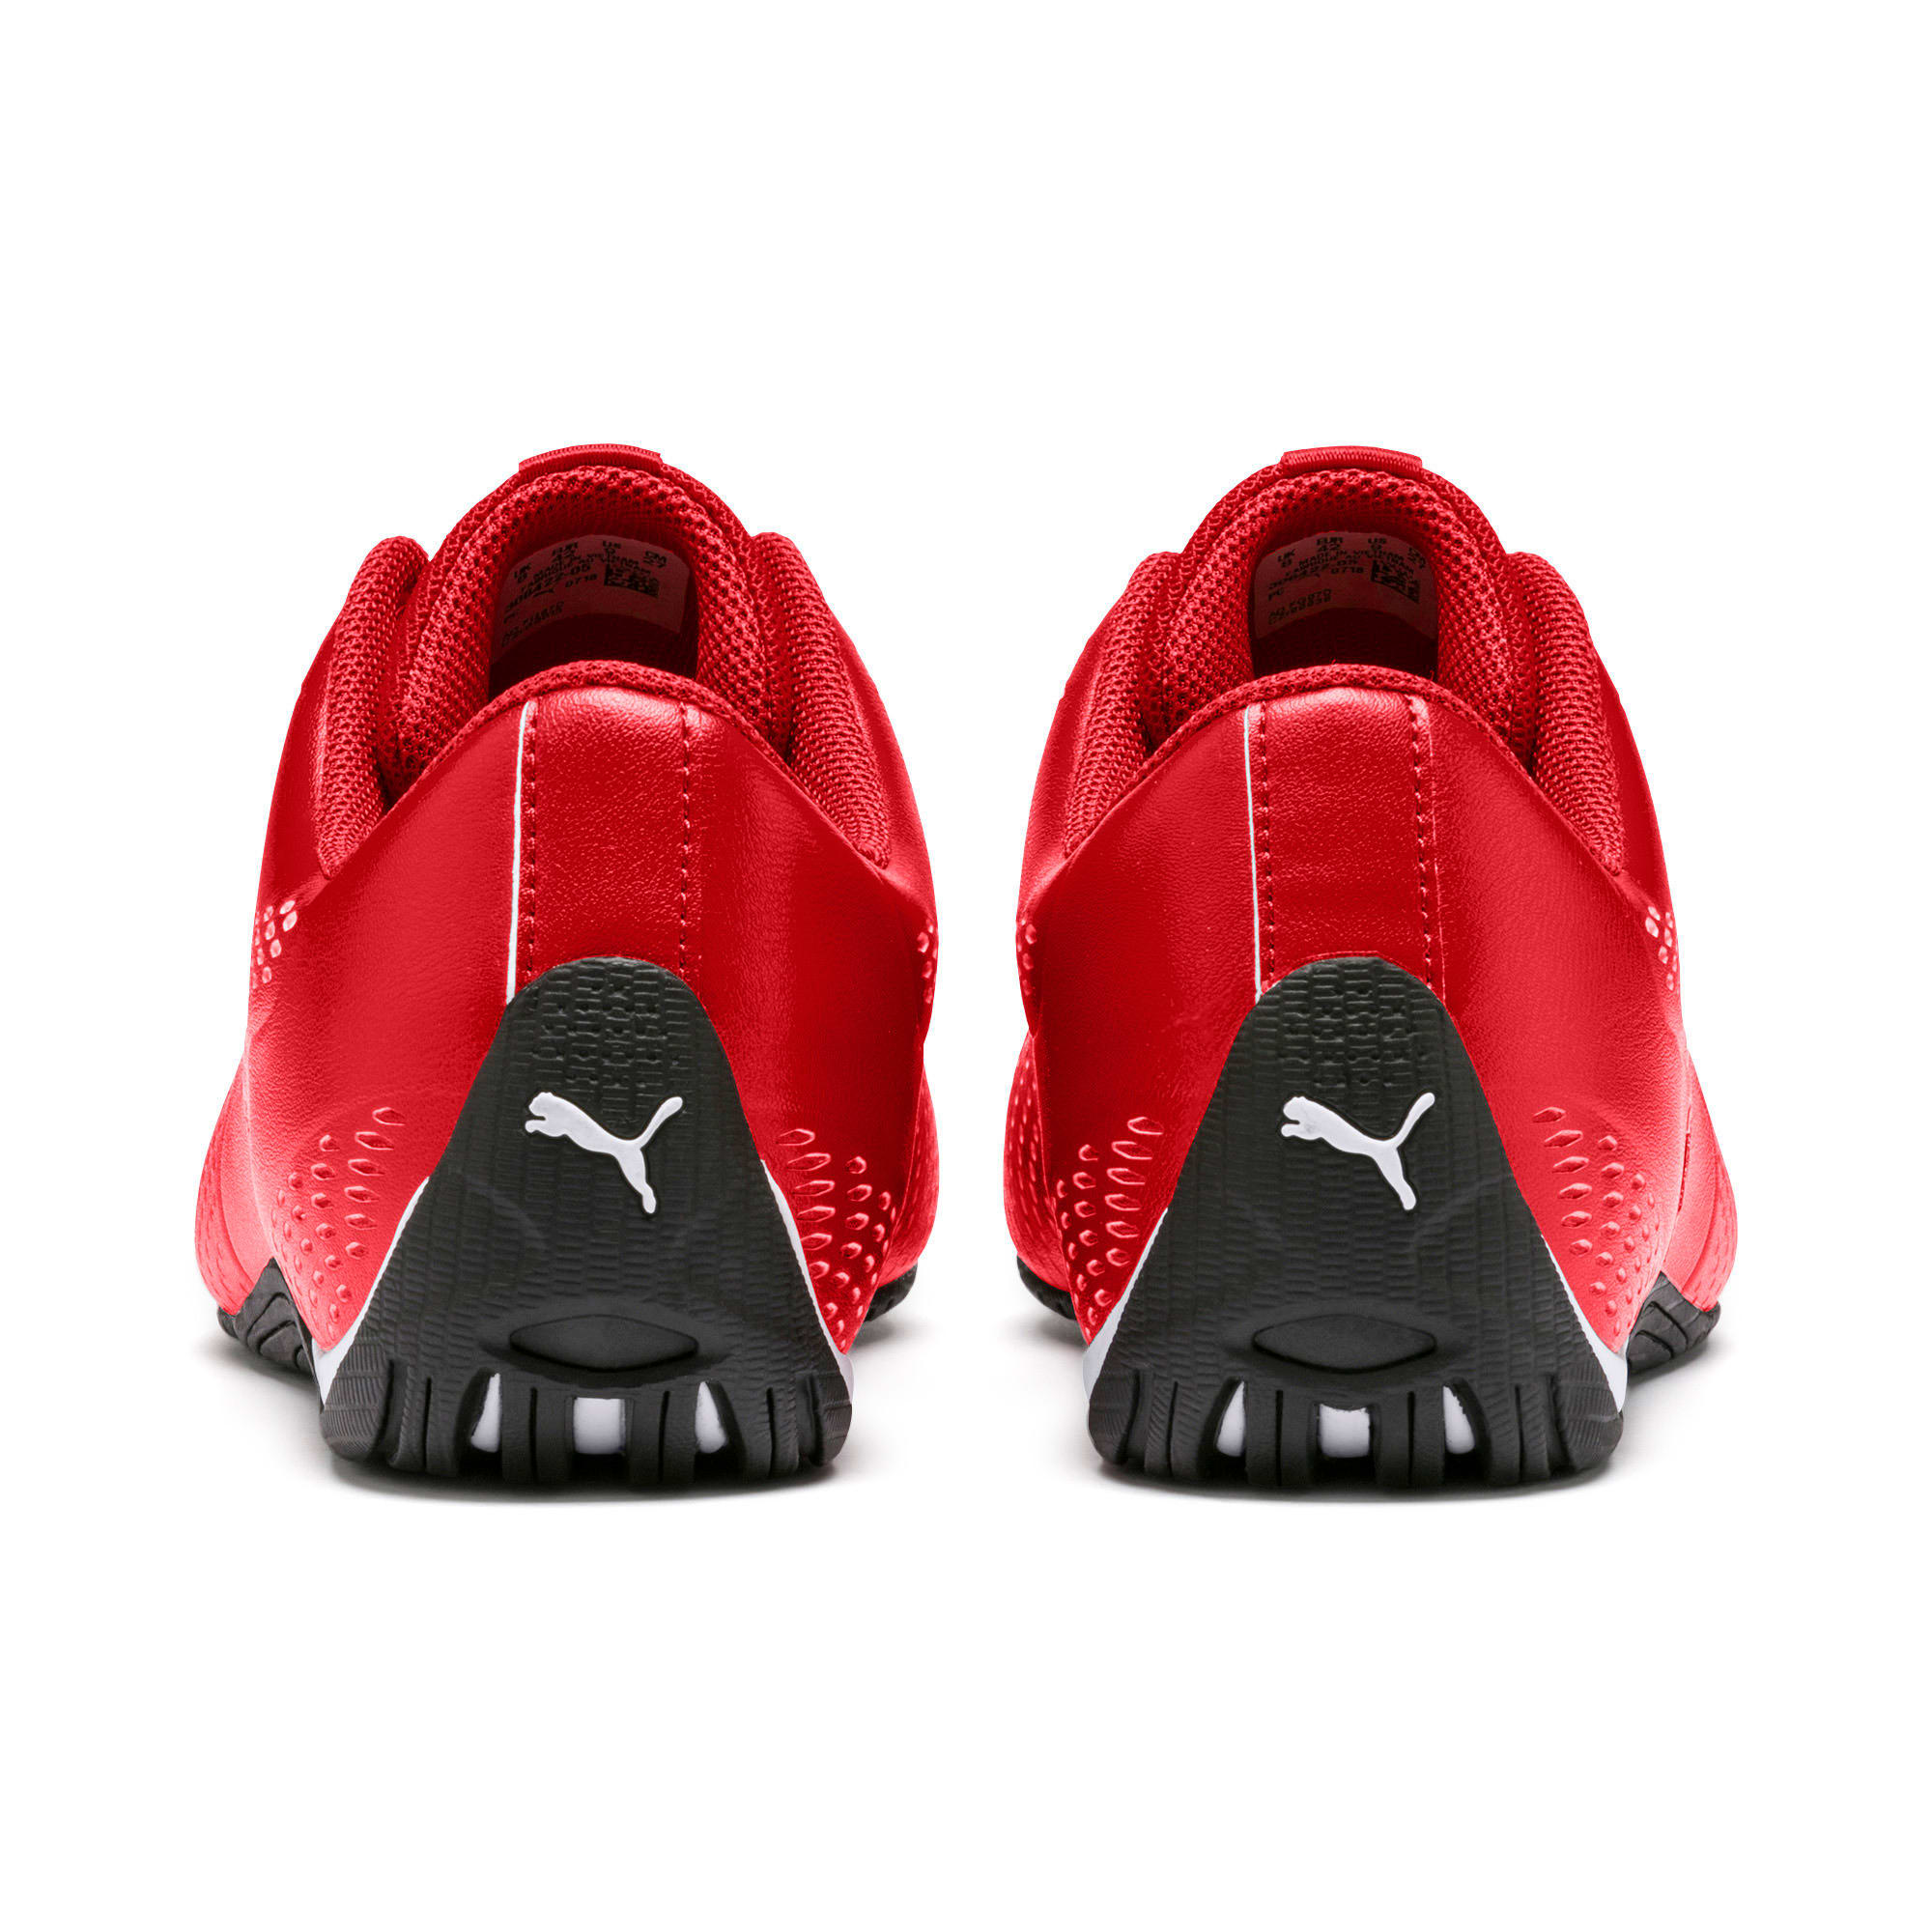 Thumbnail 5 of Ferrari Drift Cat 5 Ultra II Trainers, Rosso Corsa-Puma White, medium-IND